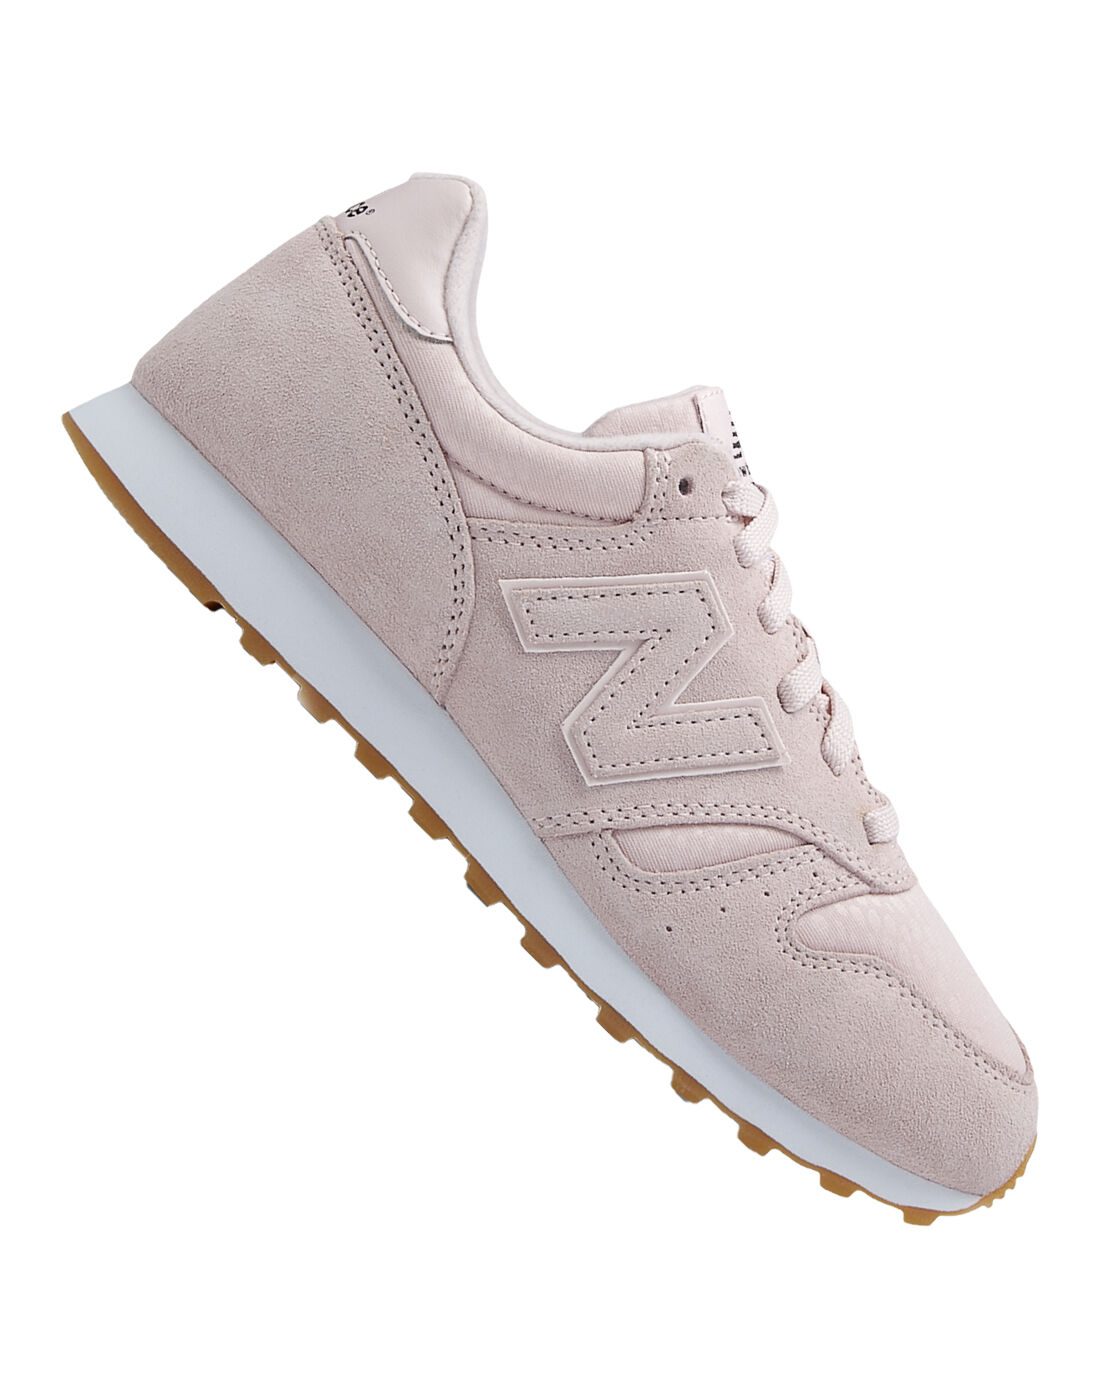 New Balance Womens 373 Trainer - Pink | Life Style Sports UK